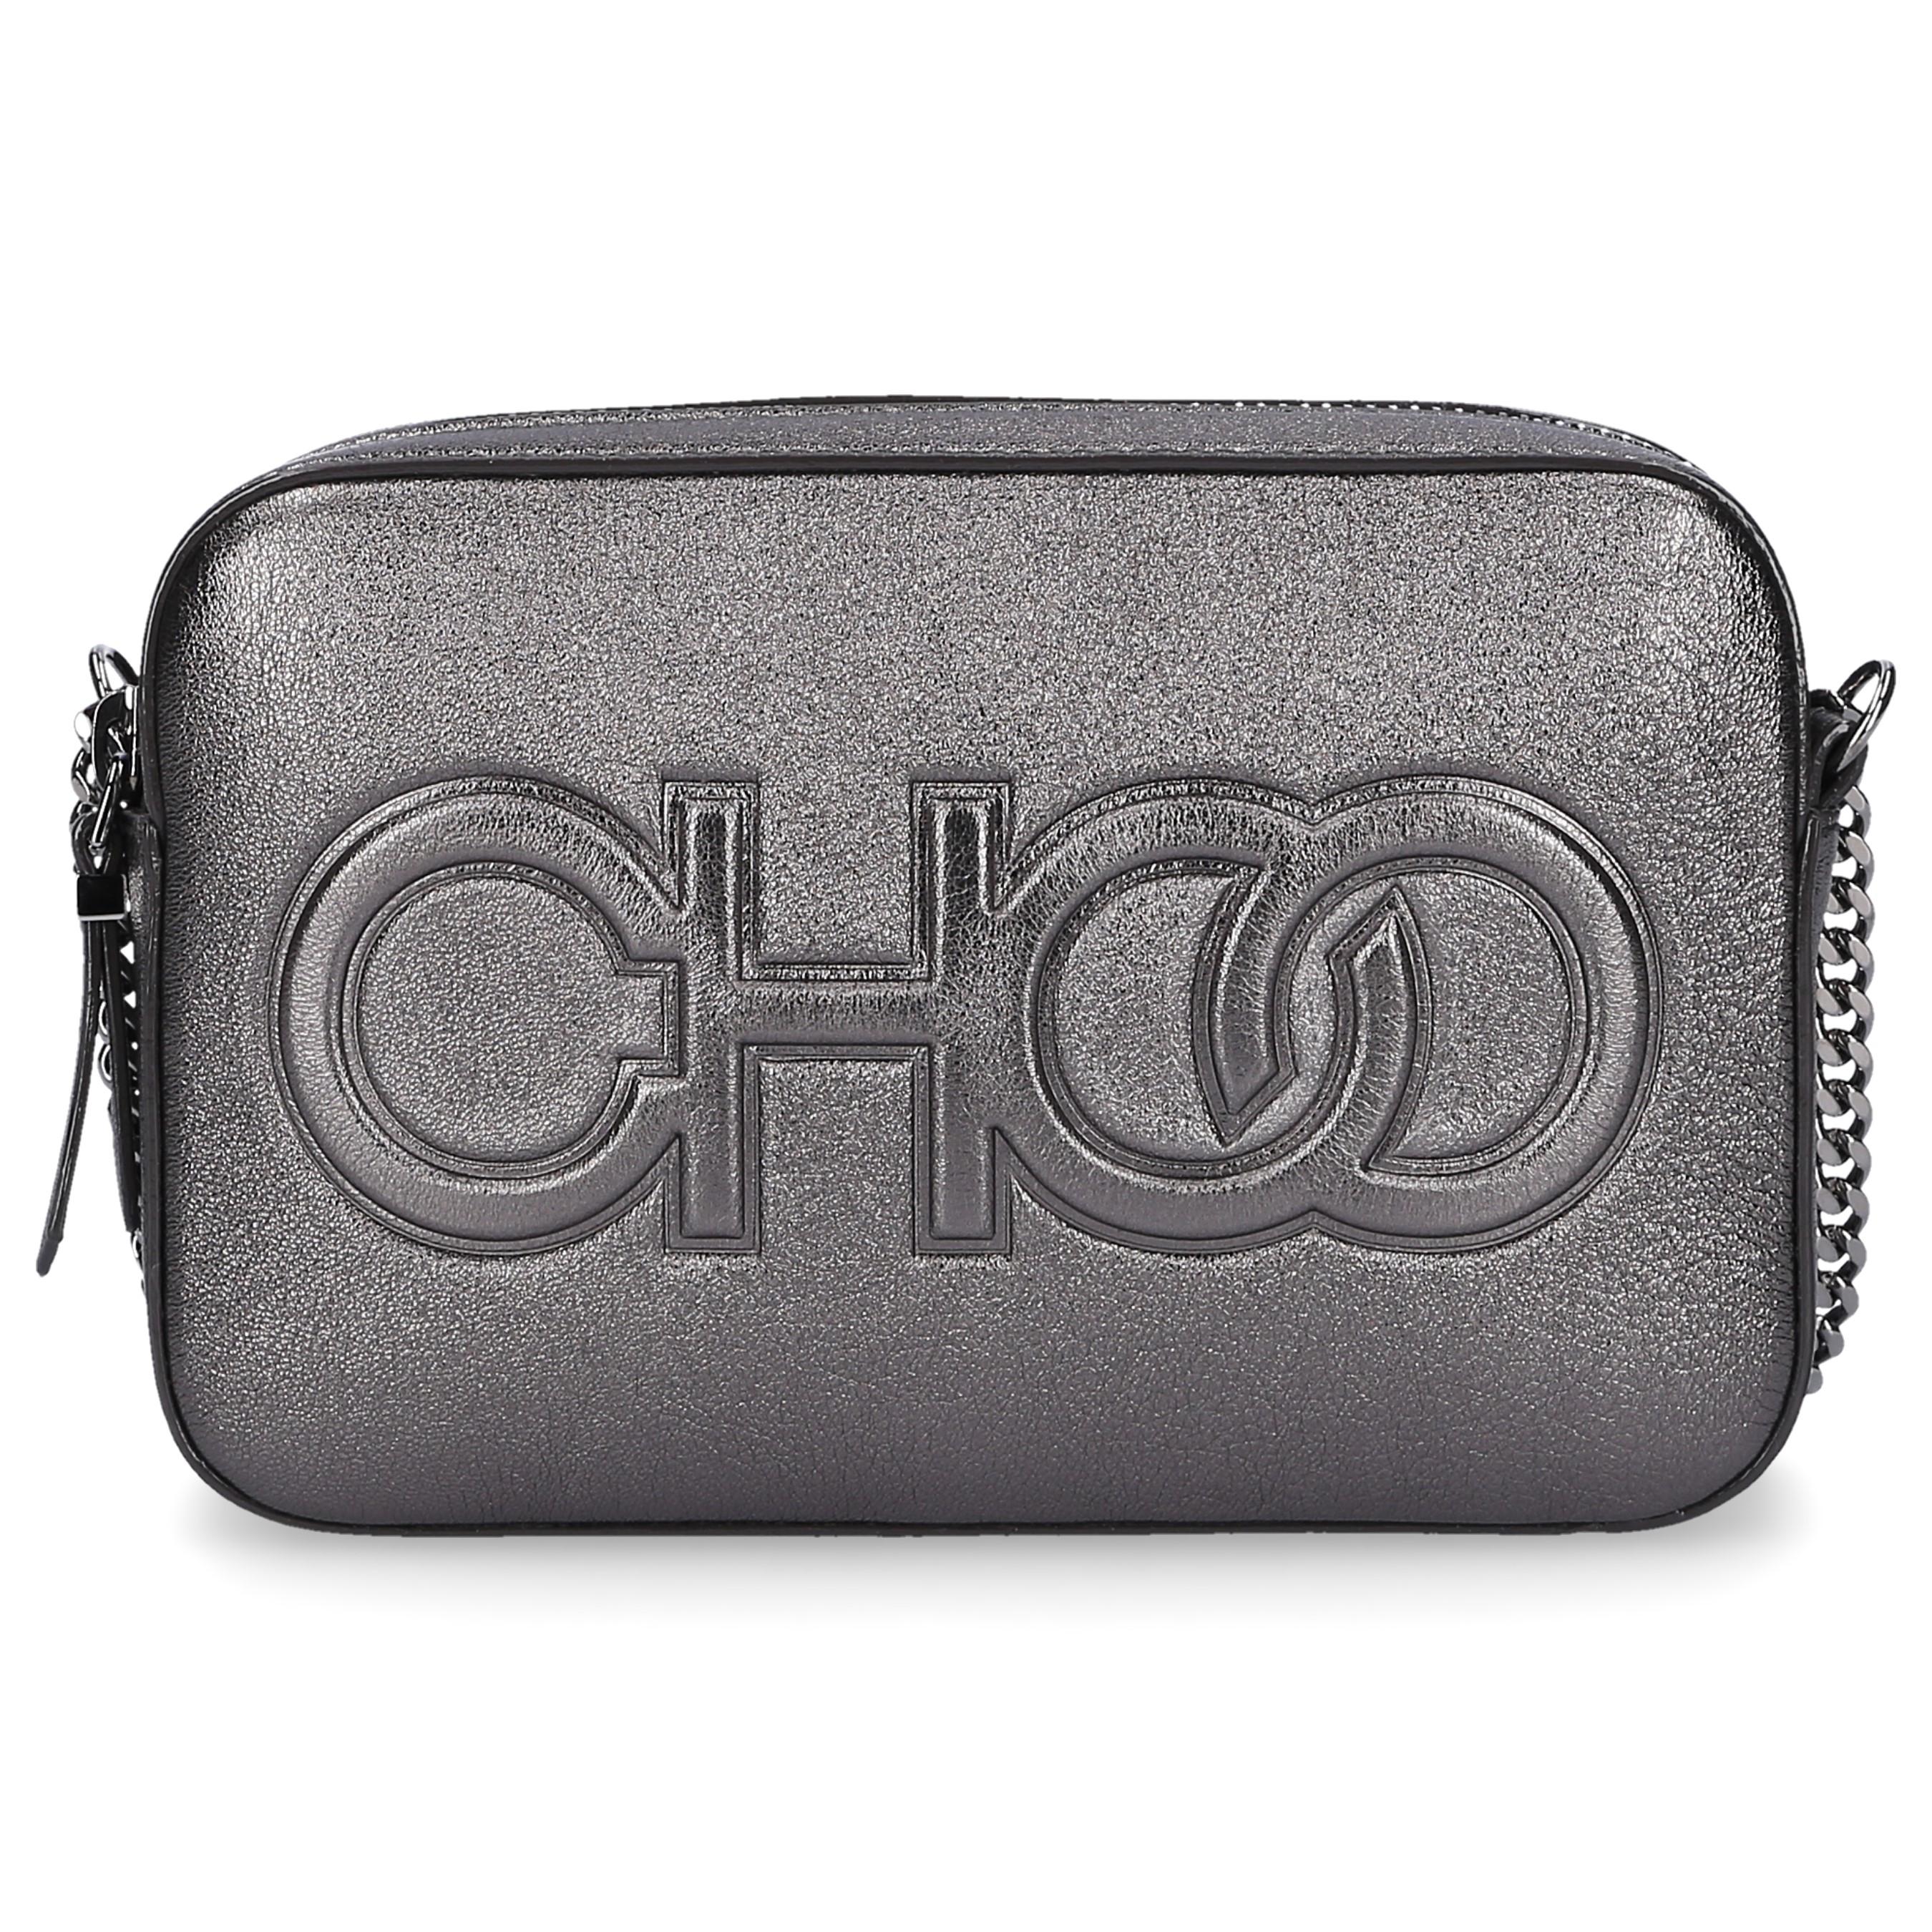 Jimmy Choo Handtasche BALTI Nappaleder Logo silber